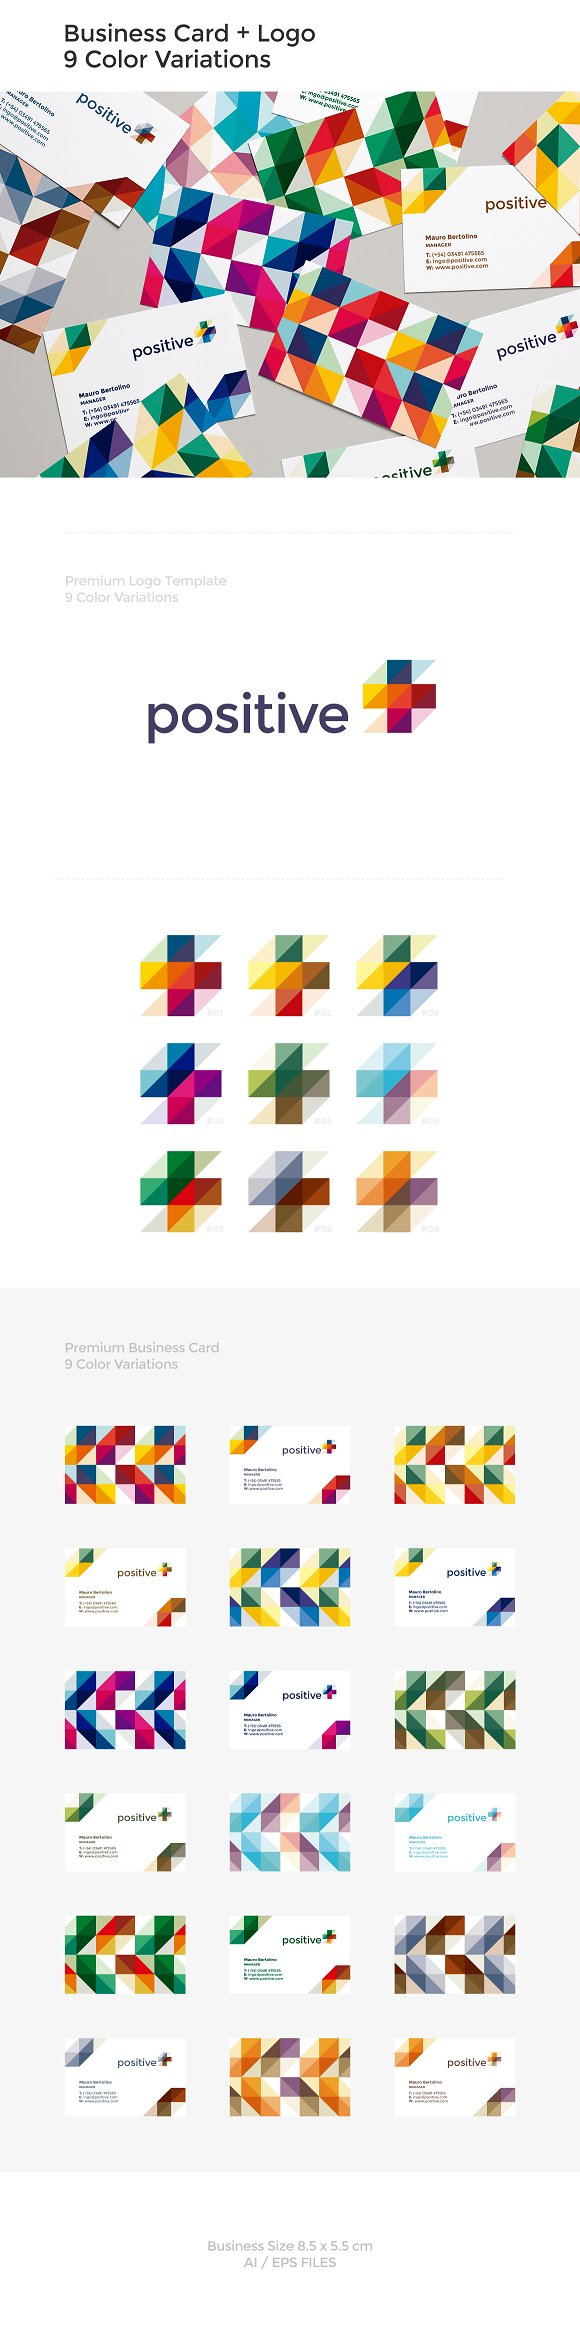 Business Card + Positive Logo ~ Business Card Templates ~ Creative ...